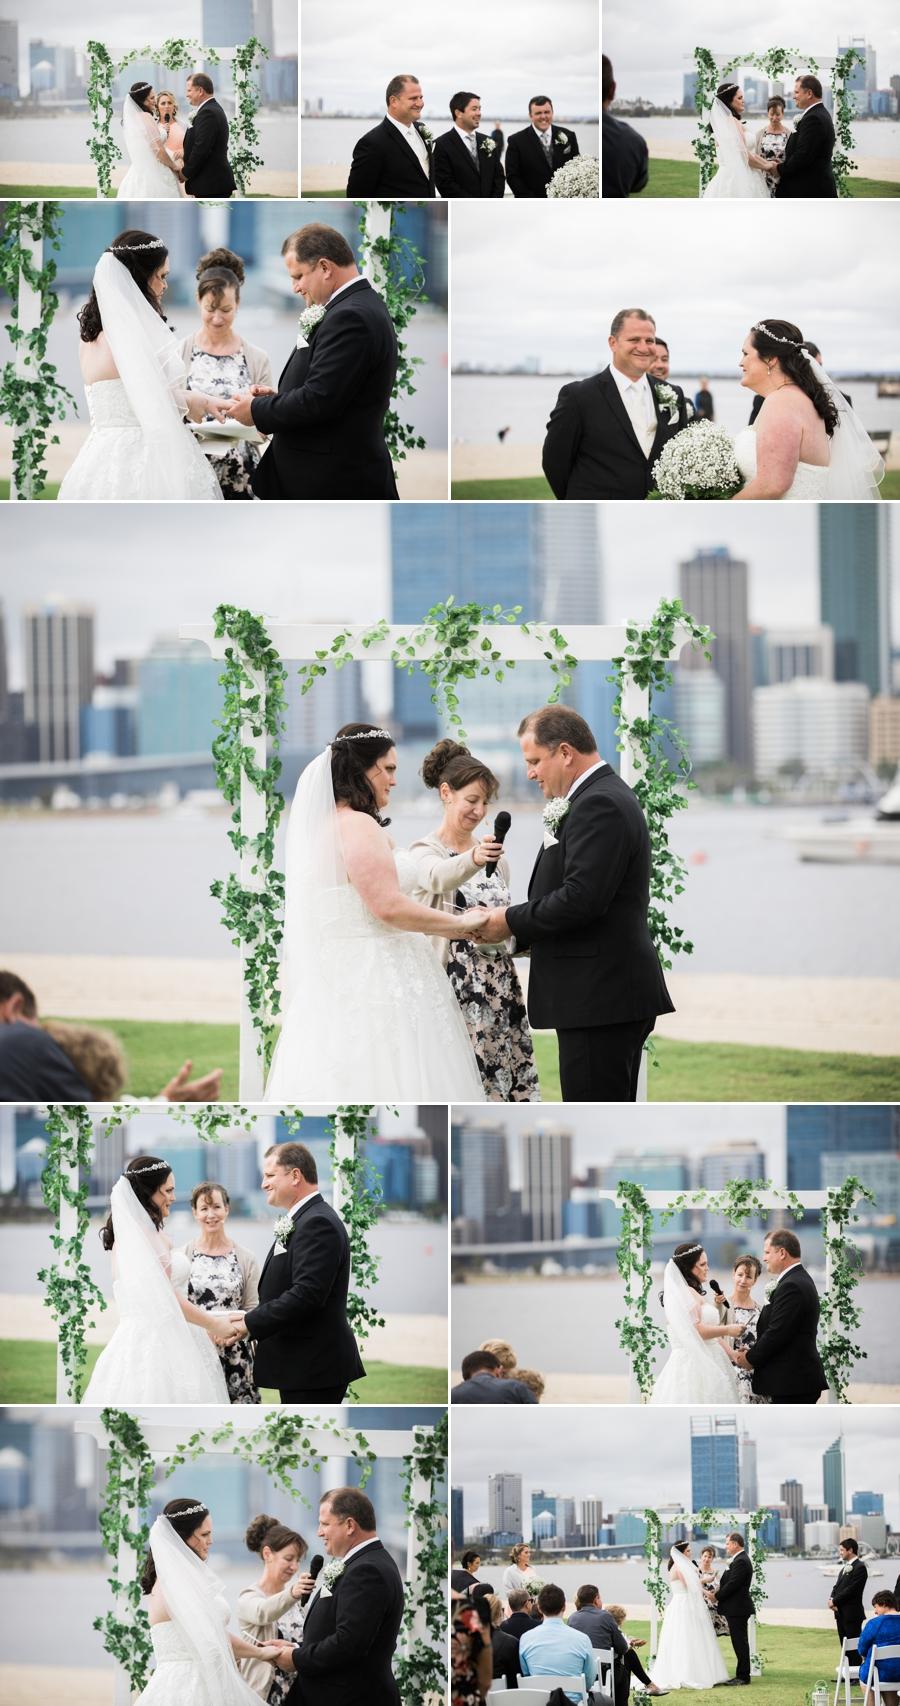 Perth-Australia-Wedding-9-1.jpg